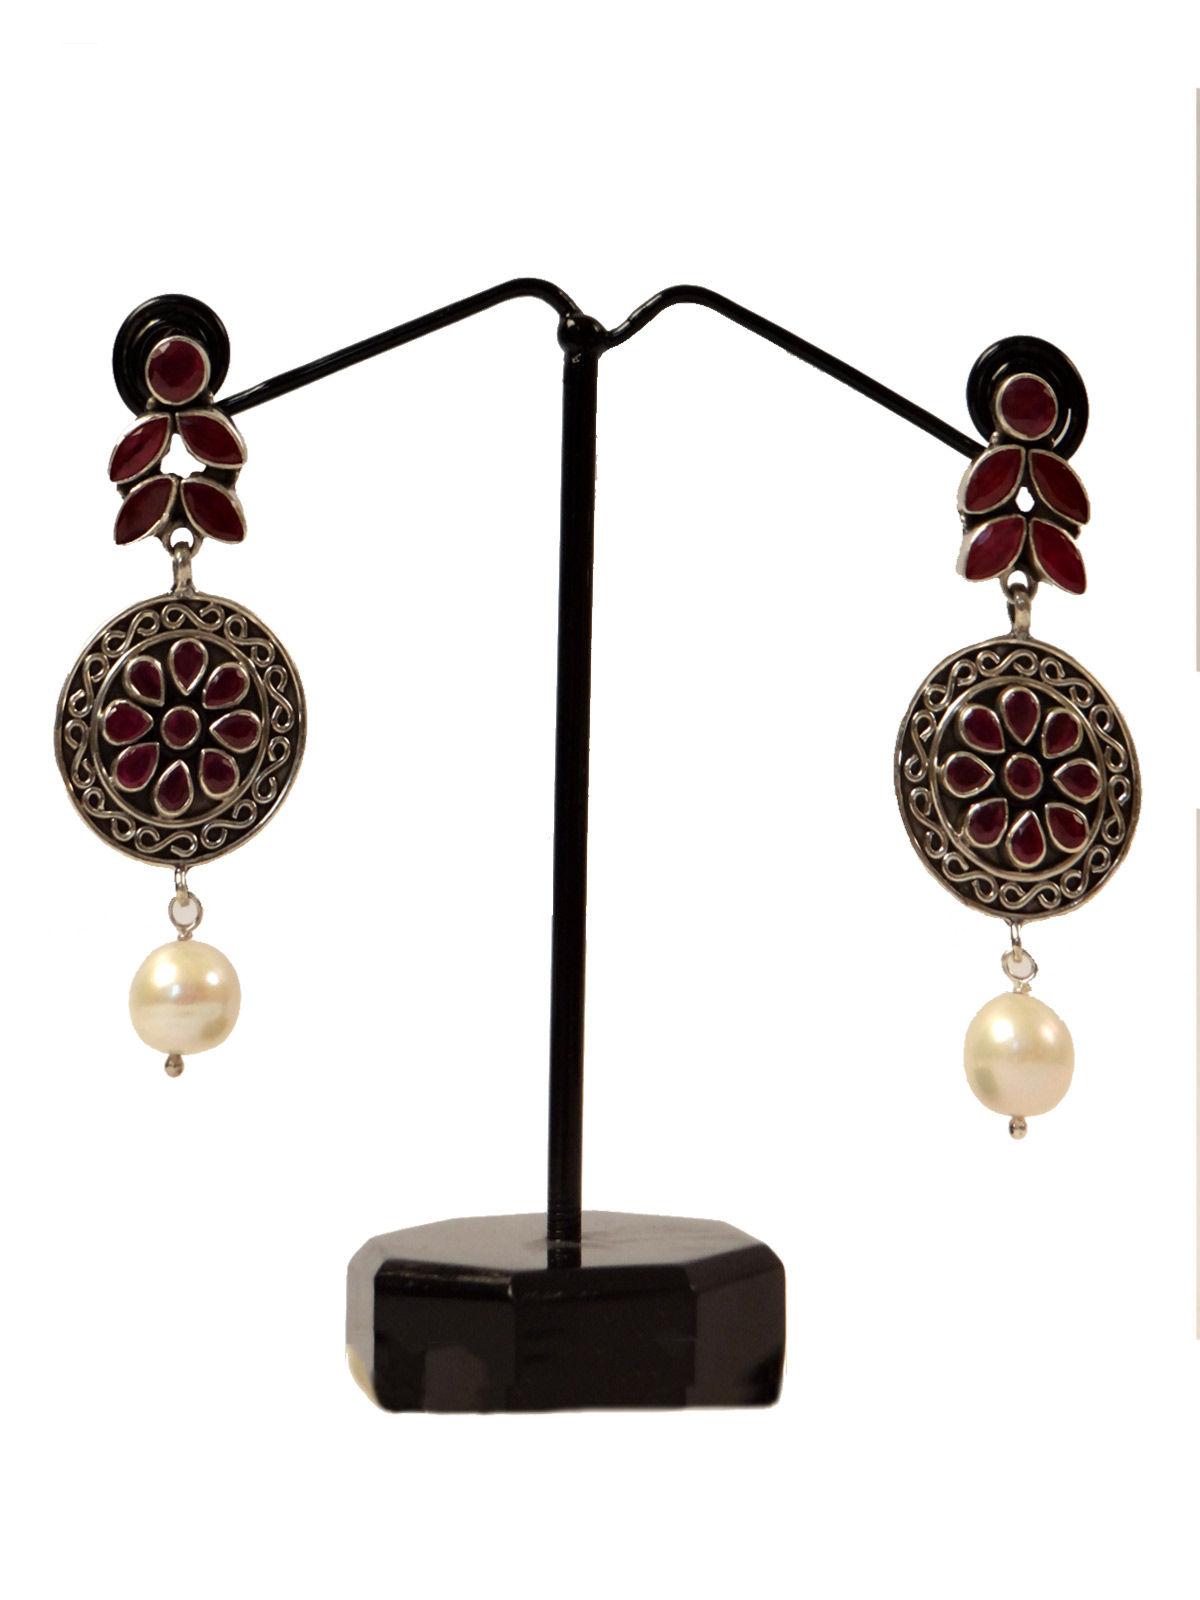 Indian August pure silver bali earrings